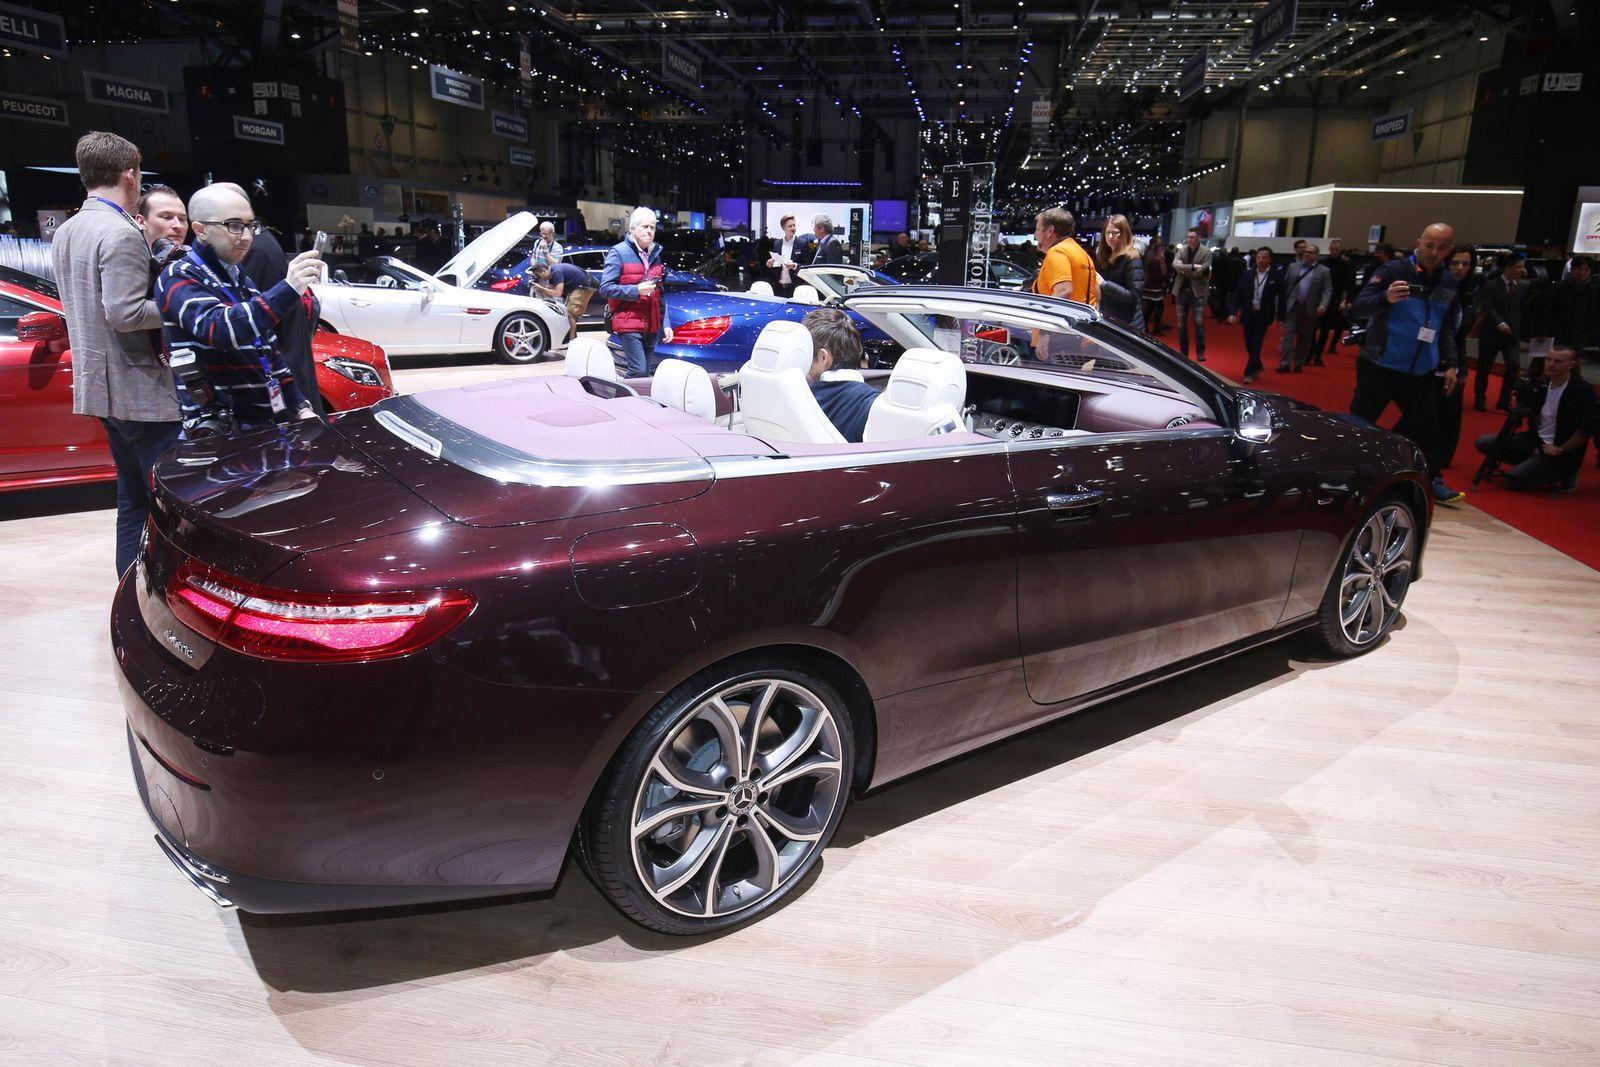 Spied! Next-Gen Mercedes-Benz CLS Shows off its Curves